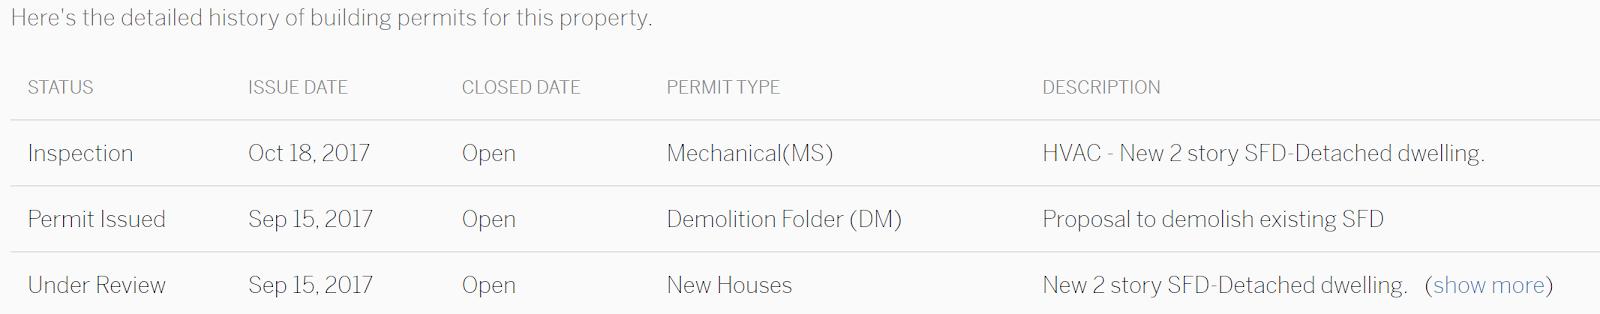 Building Permit Table Screenshot-1